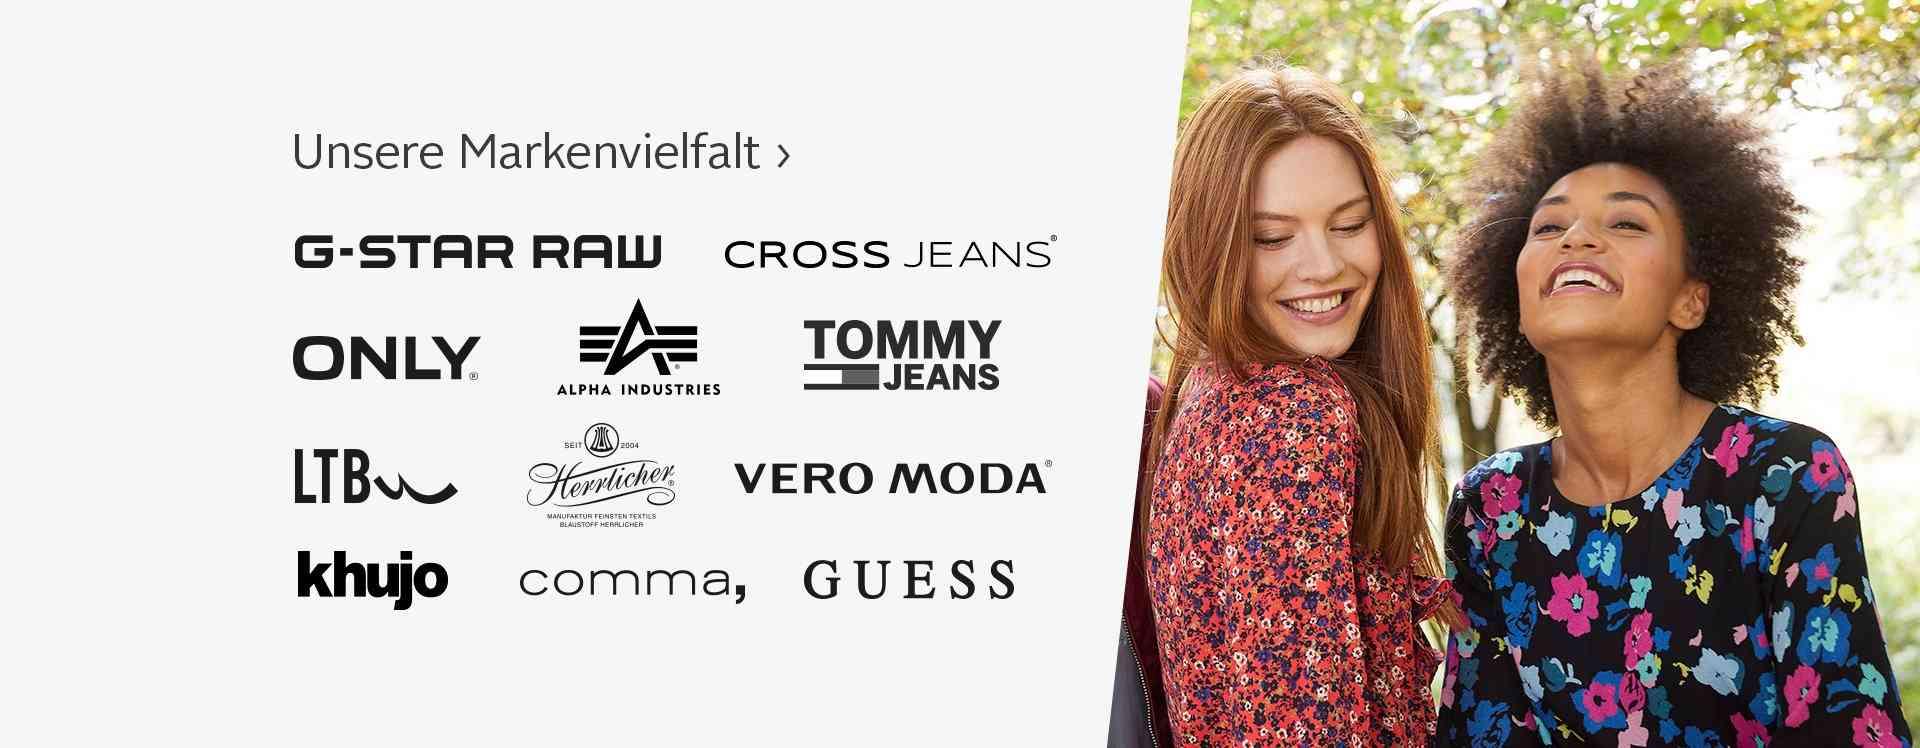 Damenmode verschiedener Marken jetzt entdecken!